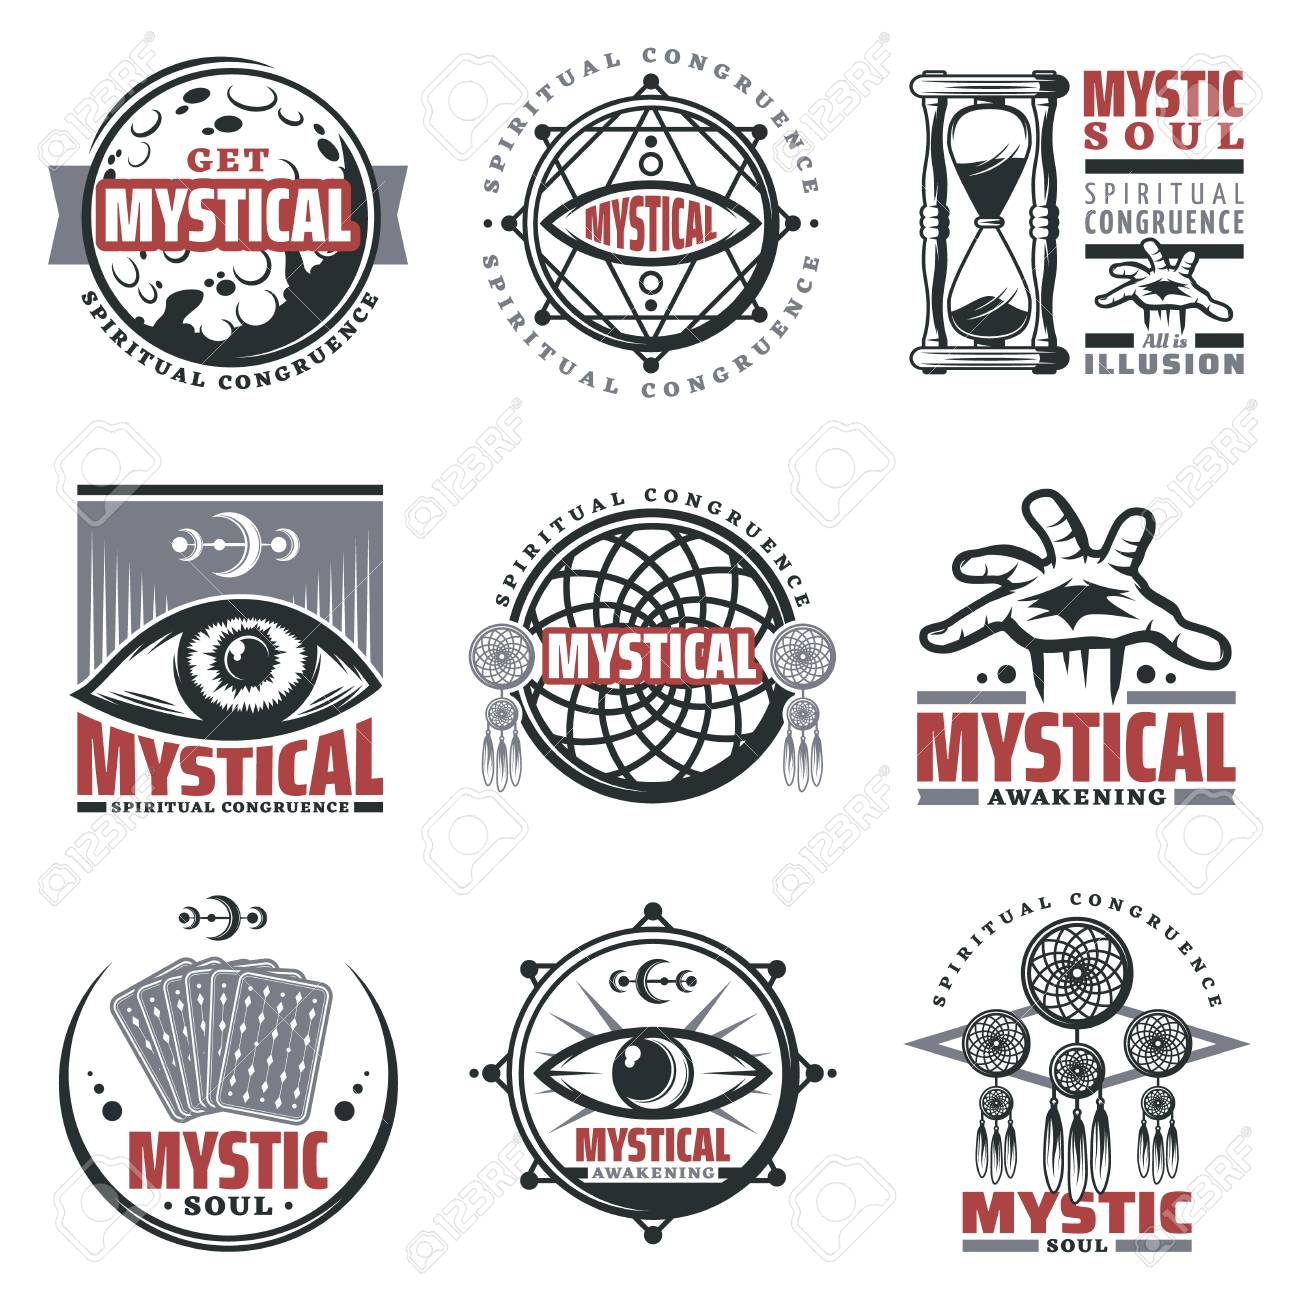 Vintage Mystical Spiritual Emblems Set With Inscriptions Moon